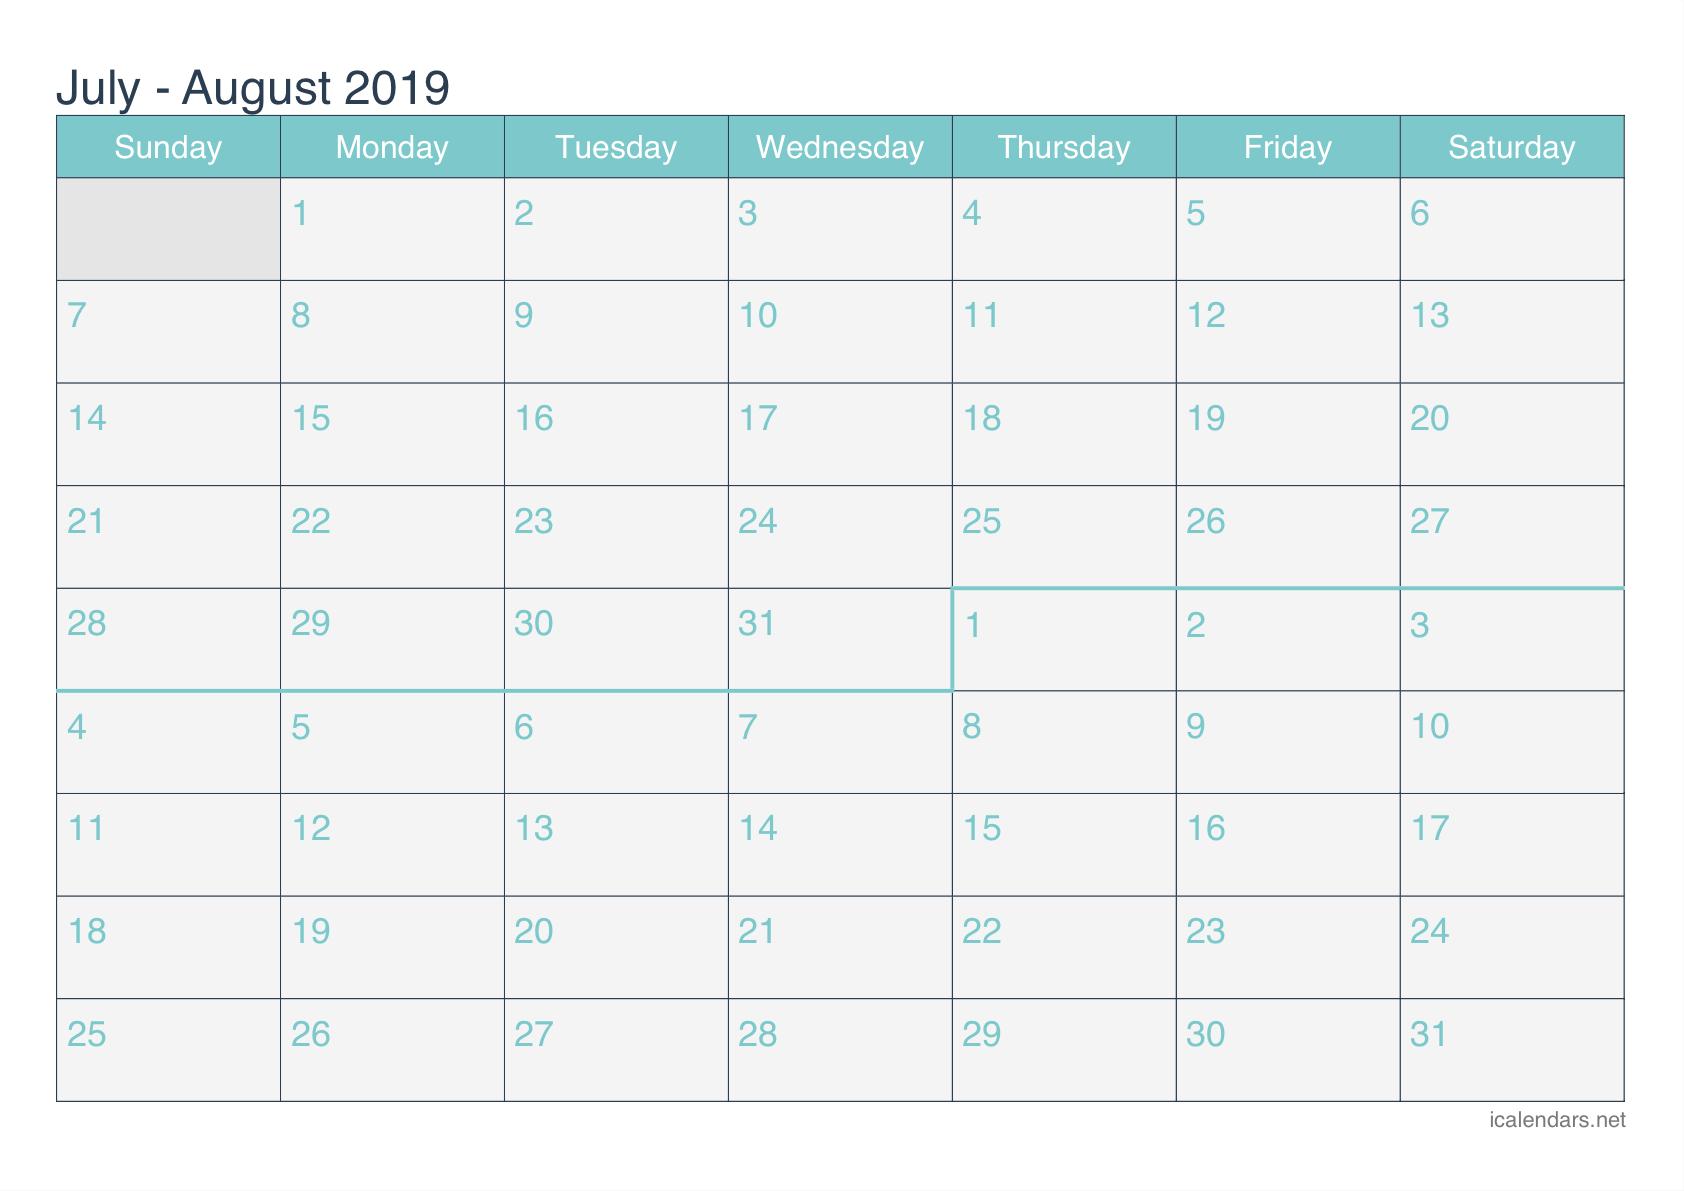 July And August 2019 Printable Calendar – Icalendars Calendar 2019 July